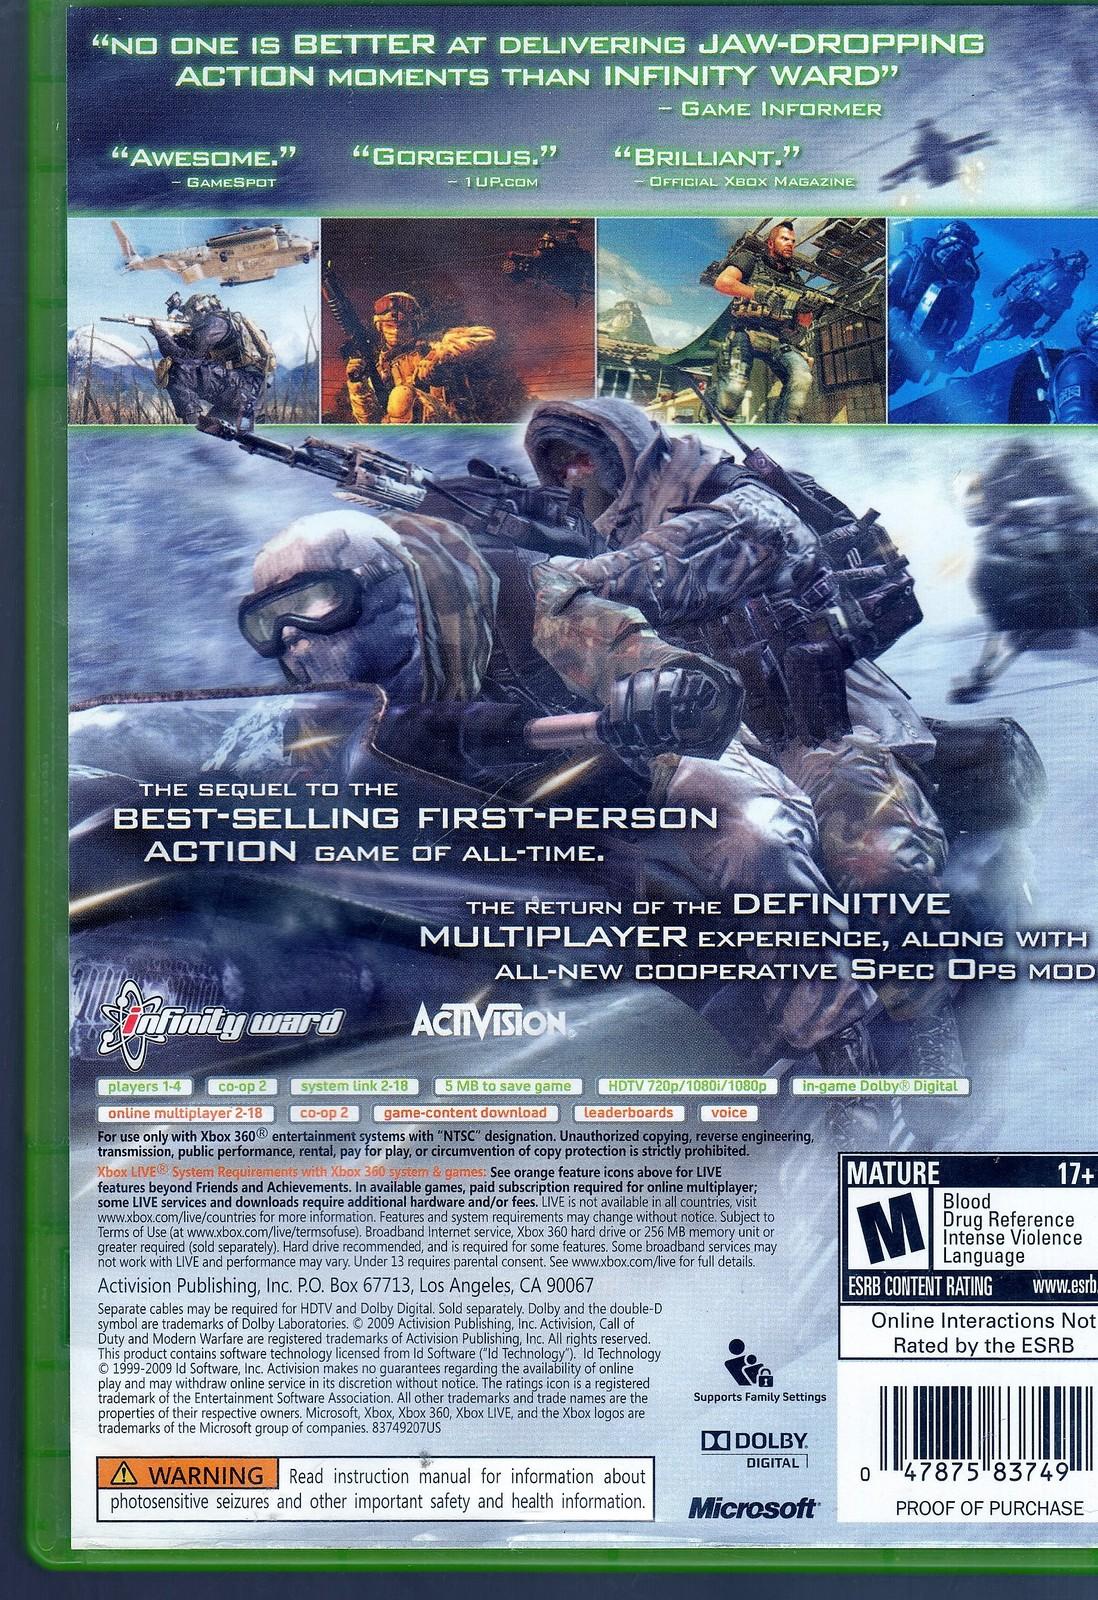 Game modern warfare 2 xbox 360 the sims 2 mobile game 320x240